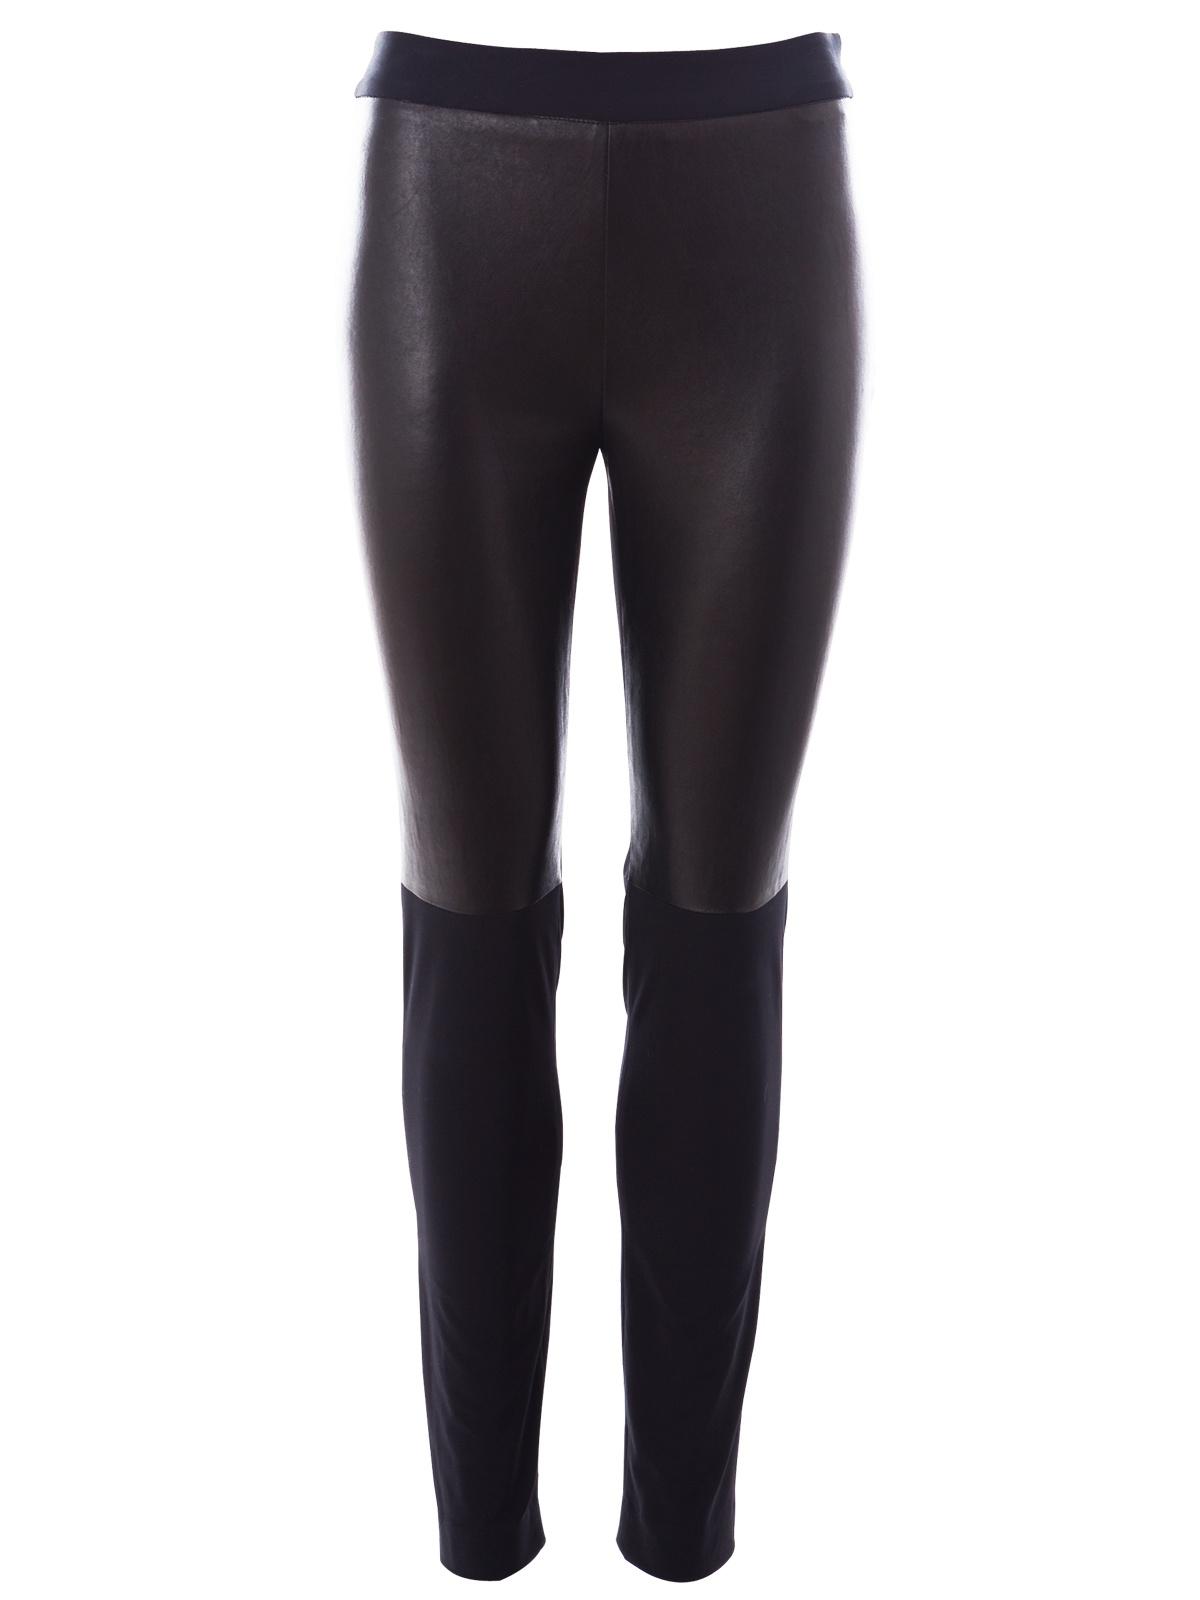 JOE BLACK STATEMENT LEGGINGS   GIRISSIMA.COM - Collectible fashion to love and to last